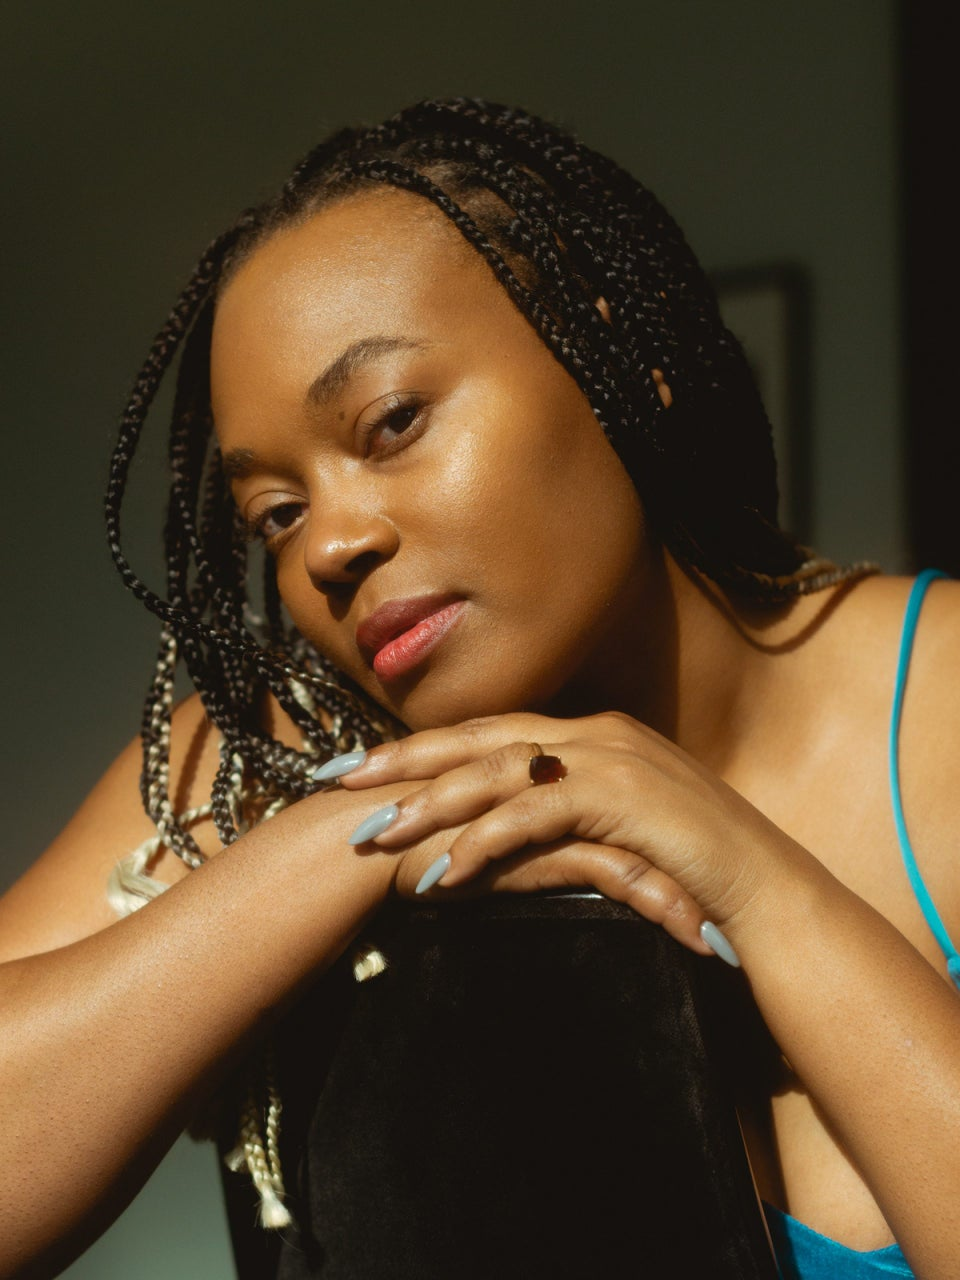 7 Independent Black Filmmakers To Watch